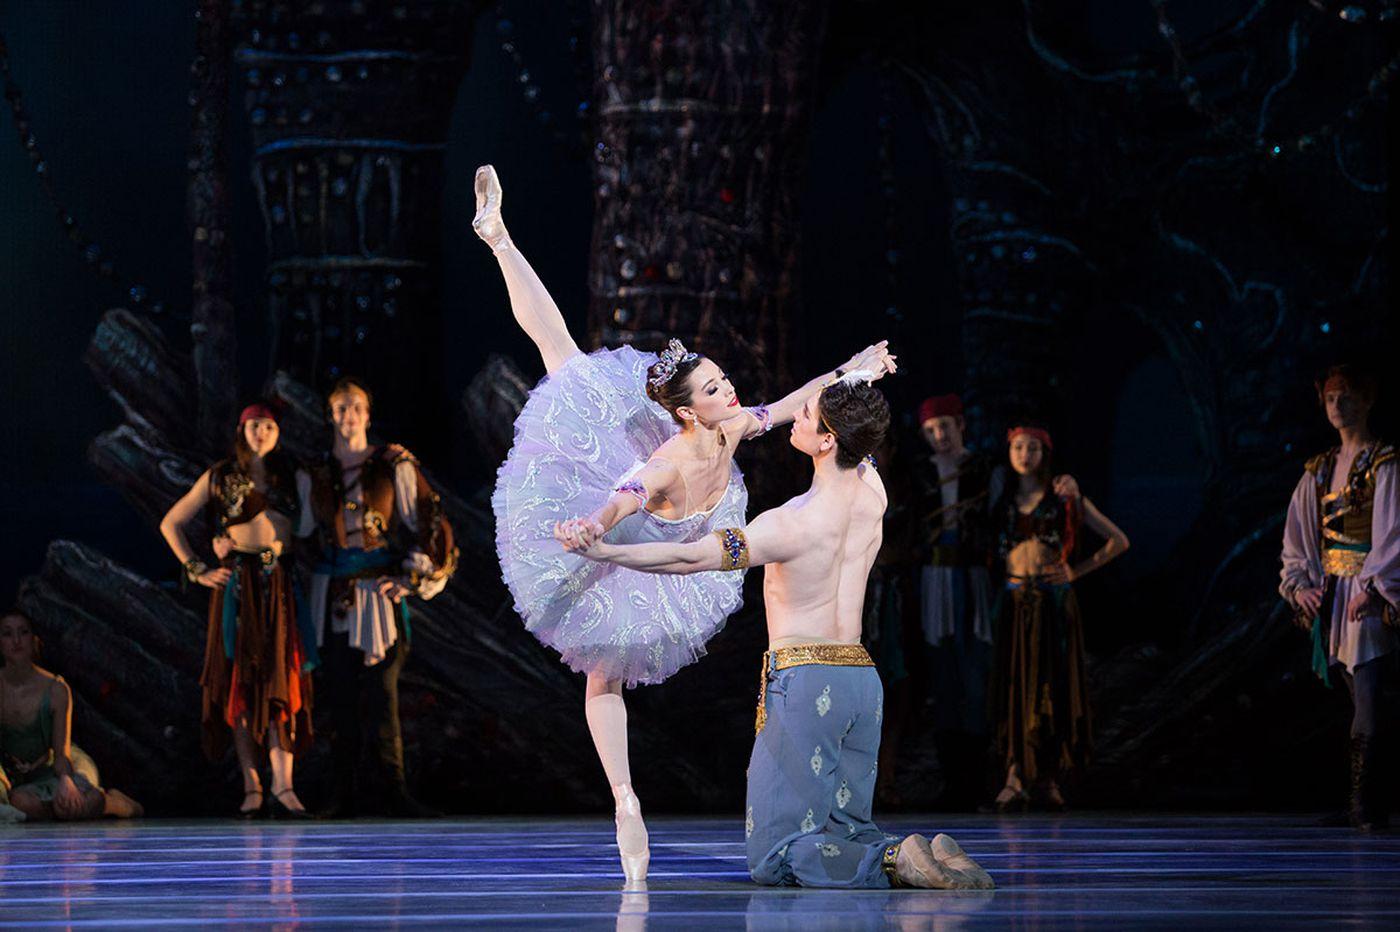 Pennsylvania Ballet's new 'Corsaire' is a stunner